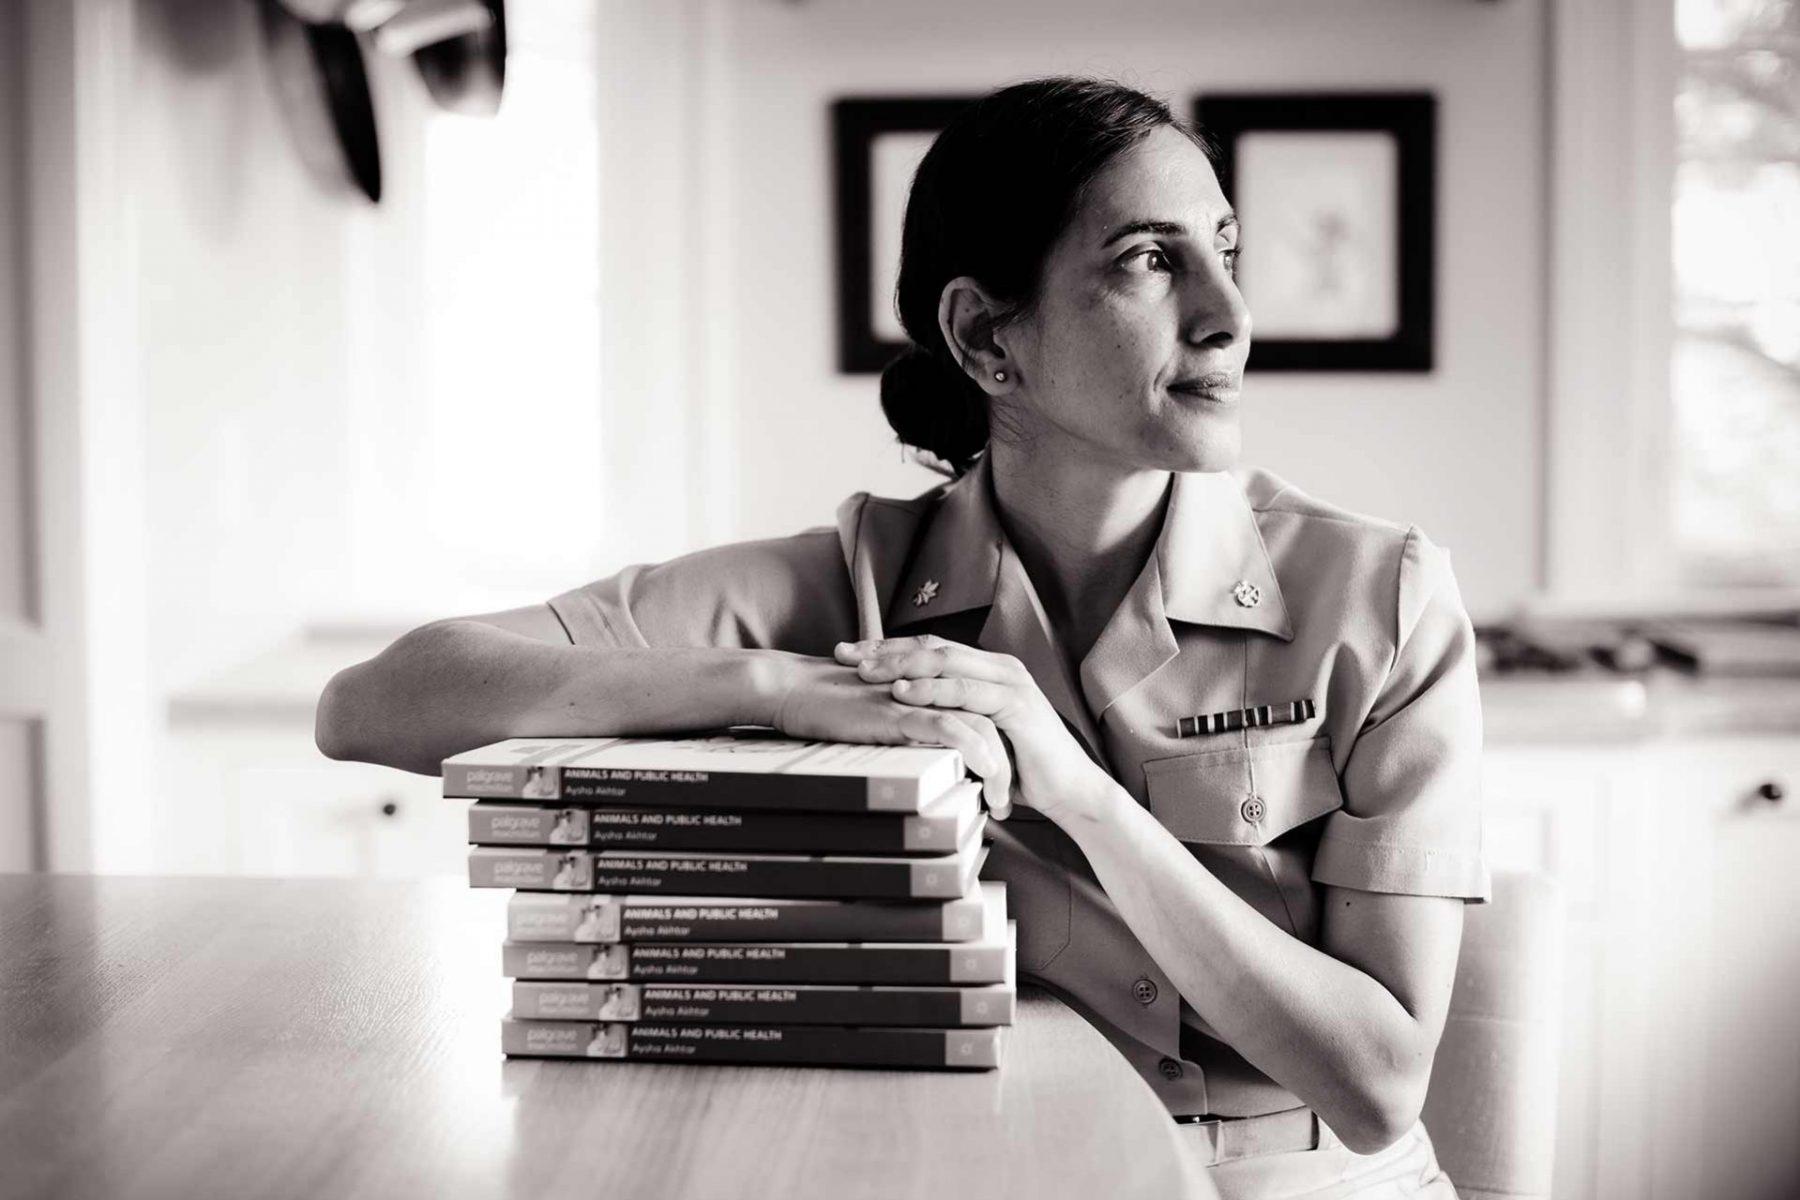 Aysha Akhtar, neurologist and specialist in preventative medicine and public health. USA, 2015